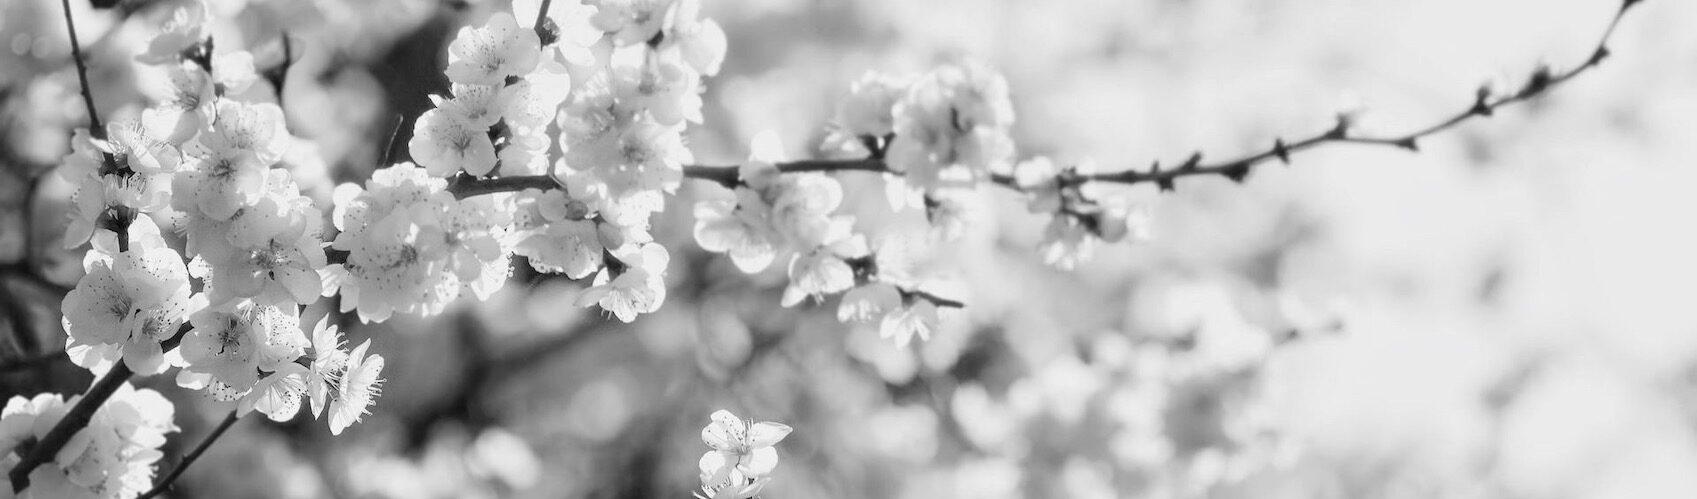 anne-cohen-writes-cherry-blossoms-gardening